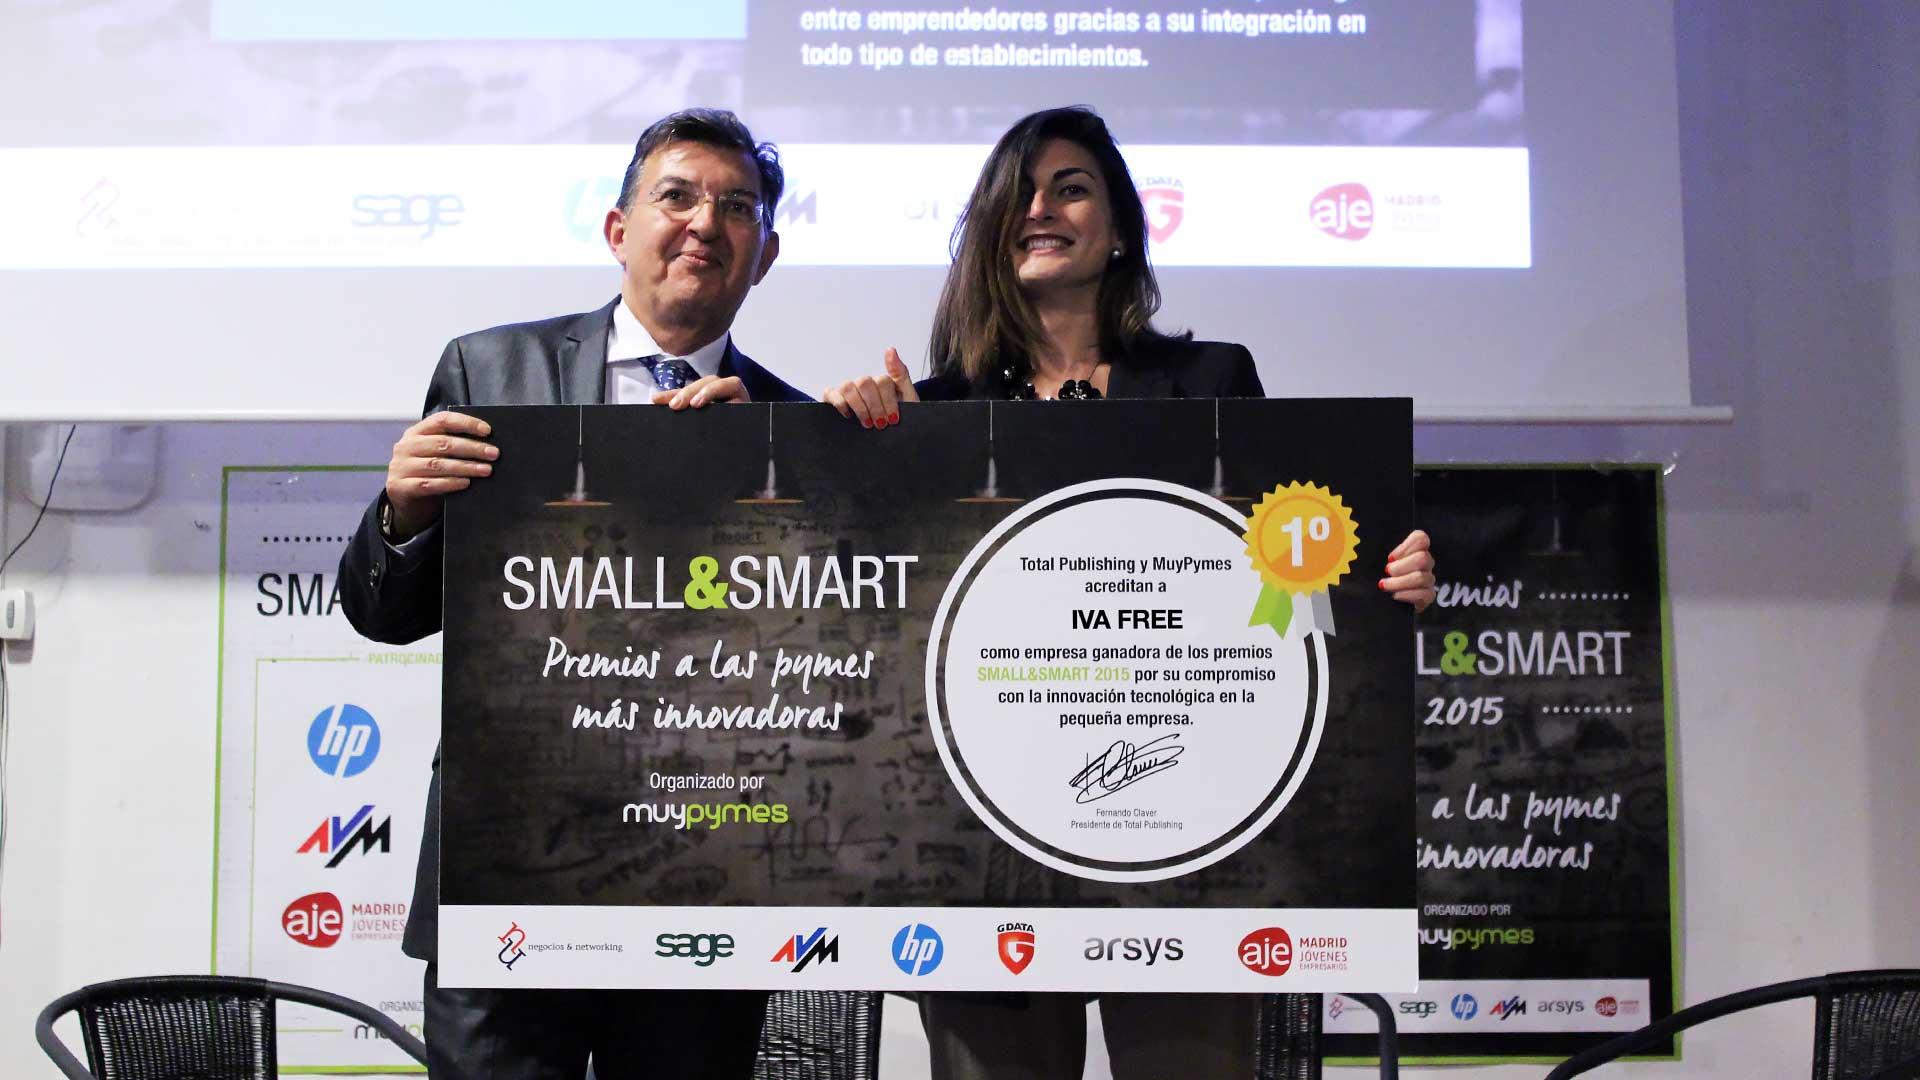 smallsmart-premios-startups-pymes-2015-ganador1-ivafree